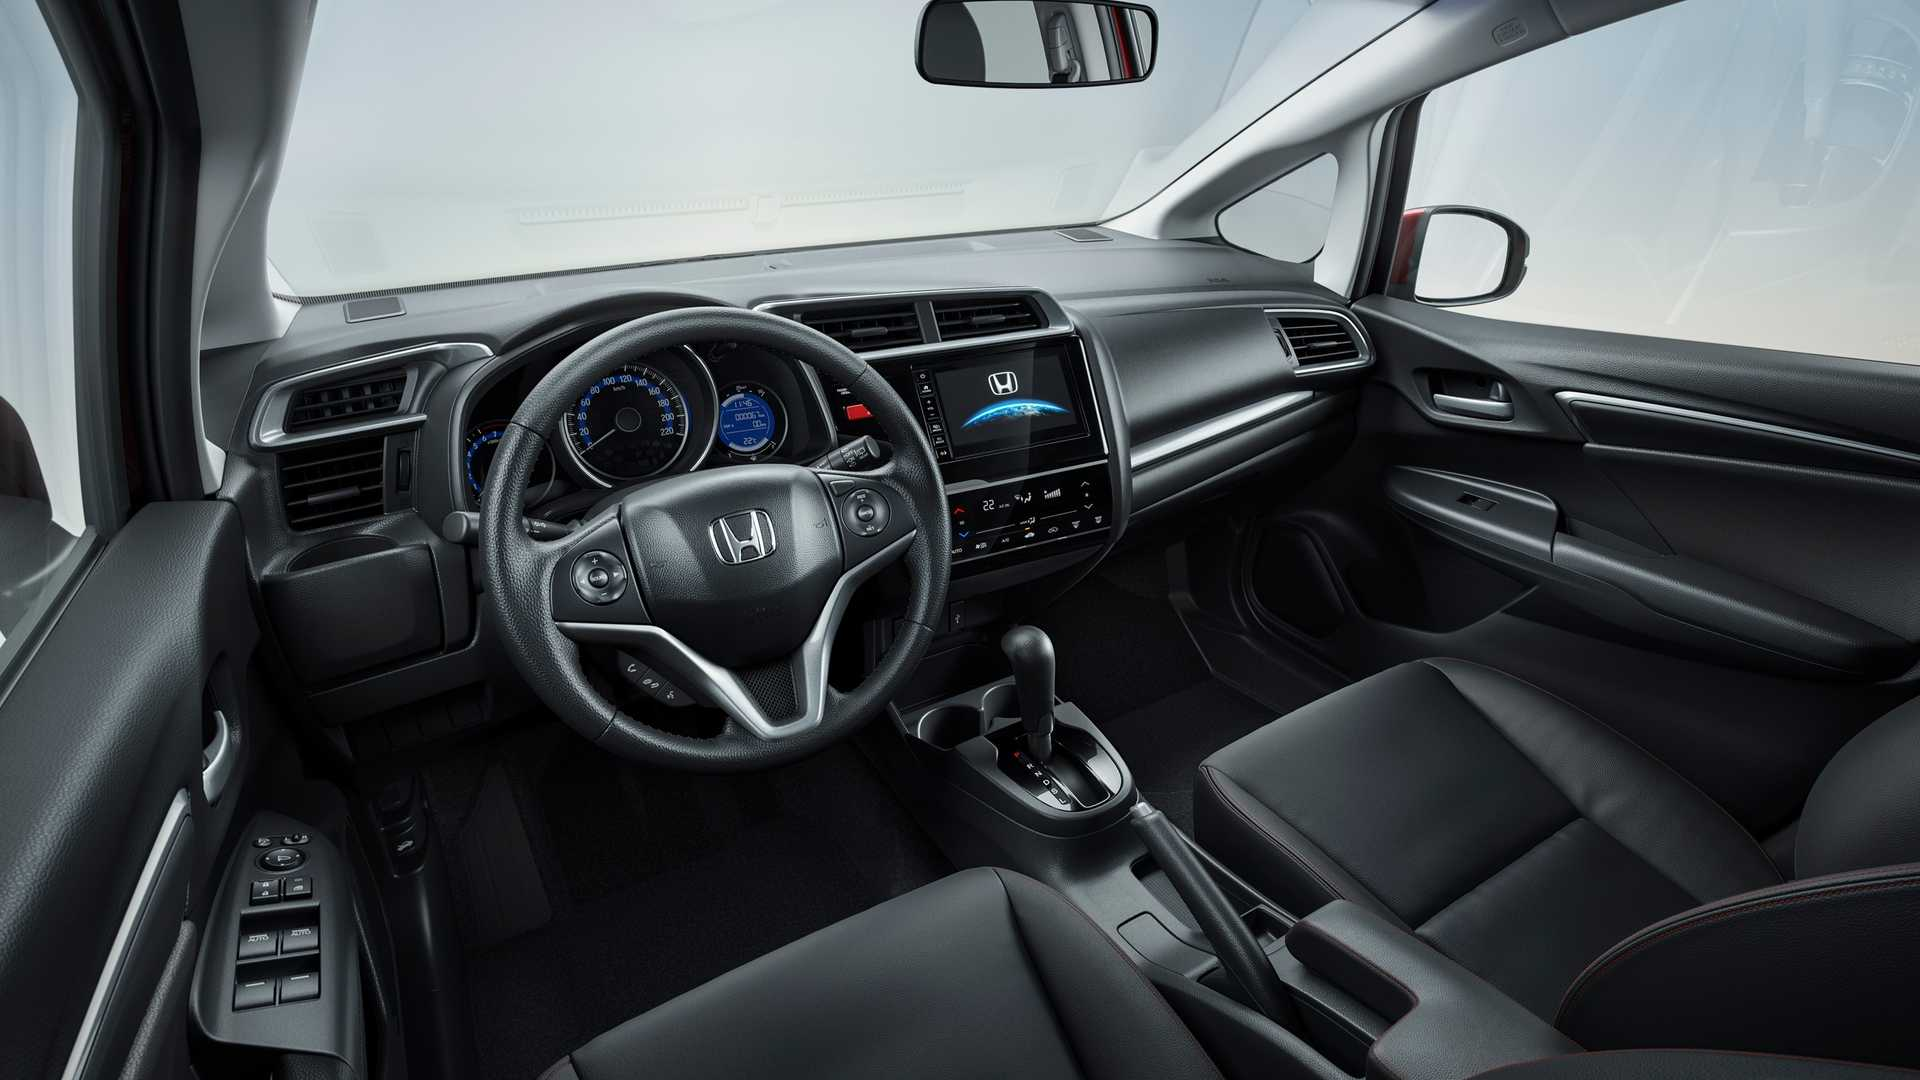 Honda Wrv 2019 Images